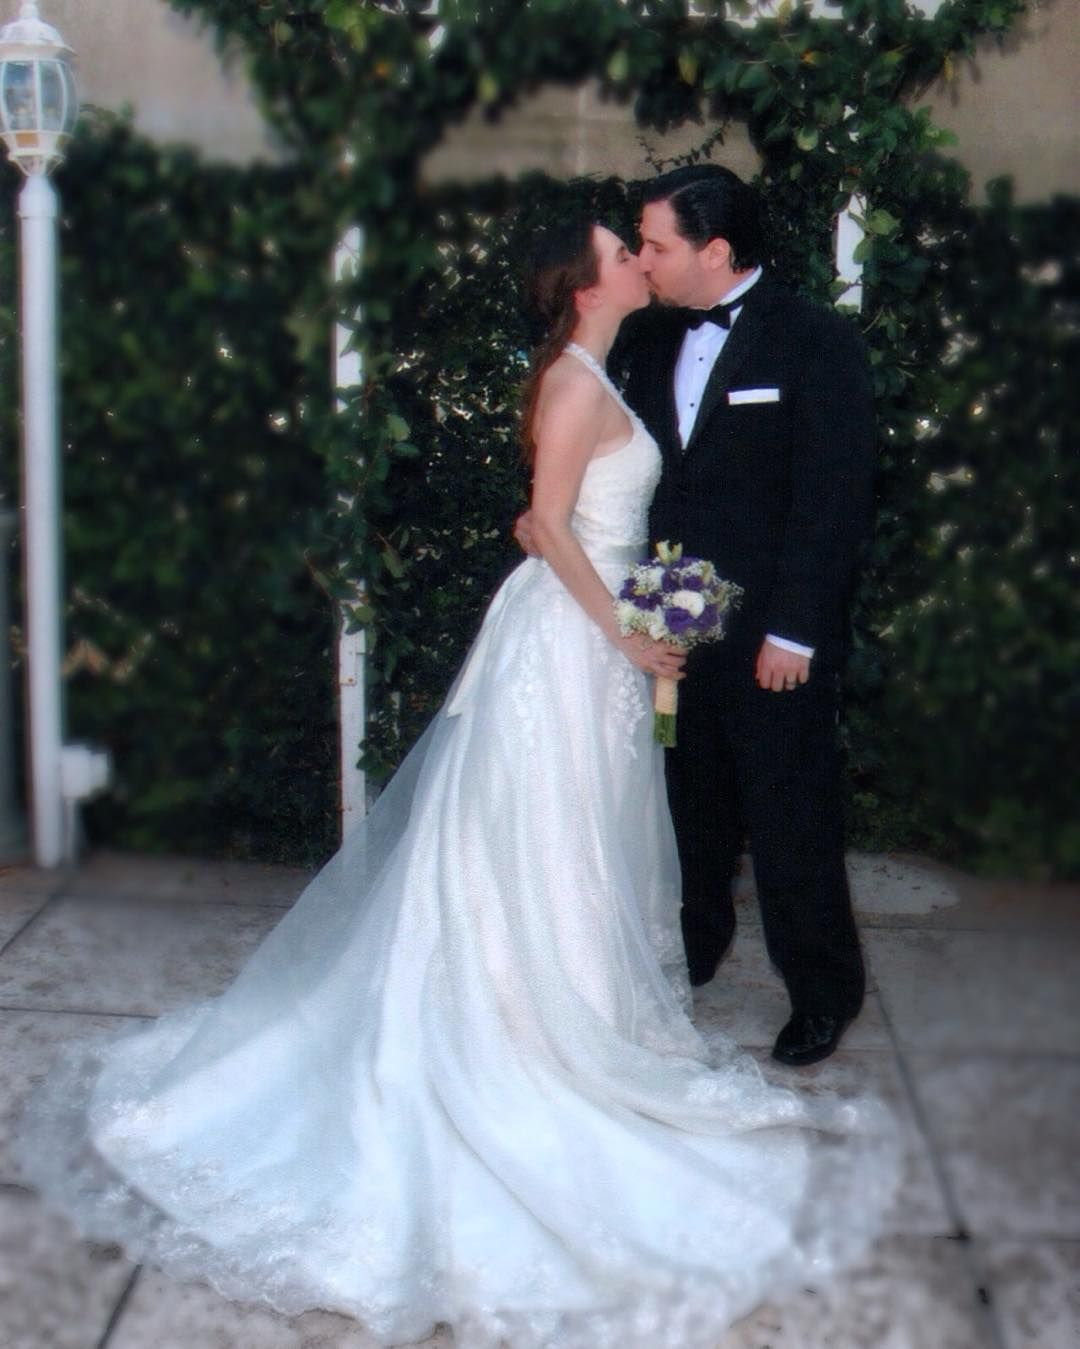 I am feeling so nostalgic today. It has almost been one year.  #chribecca #FBF #myweddingday